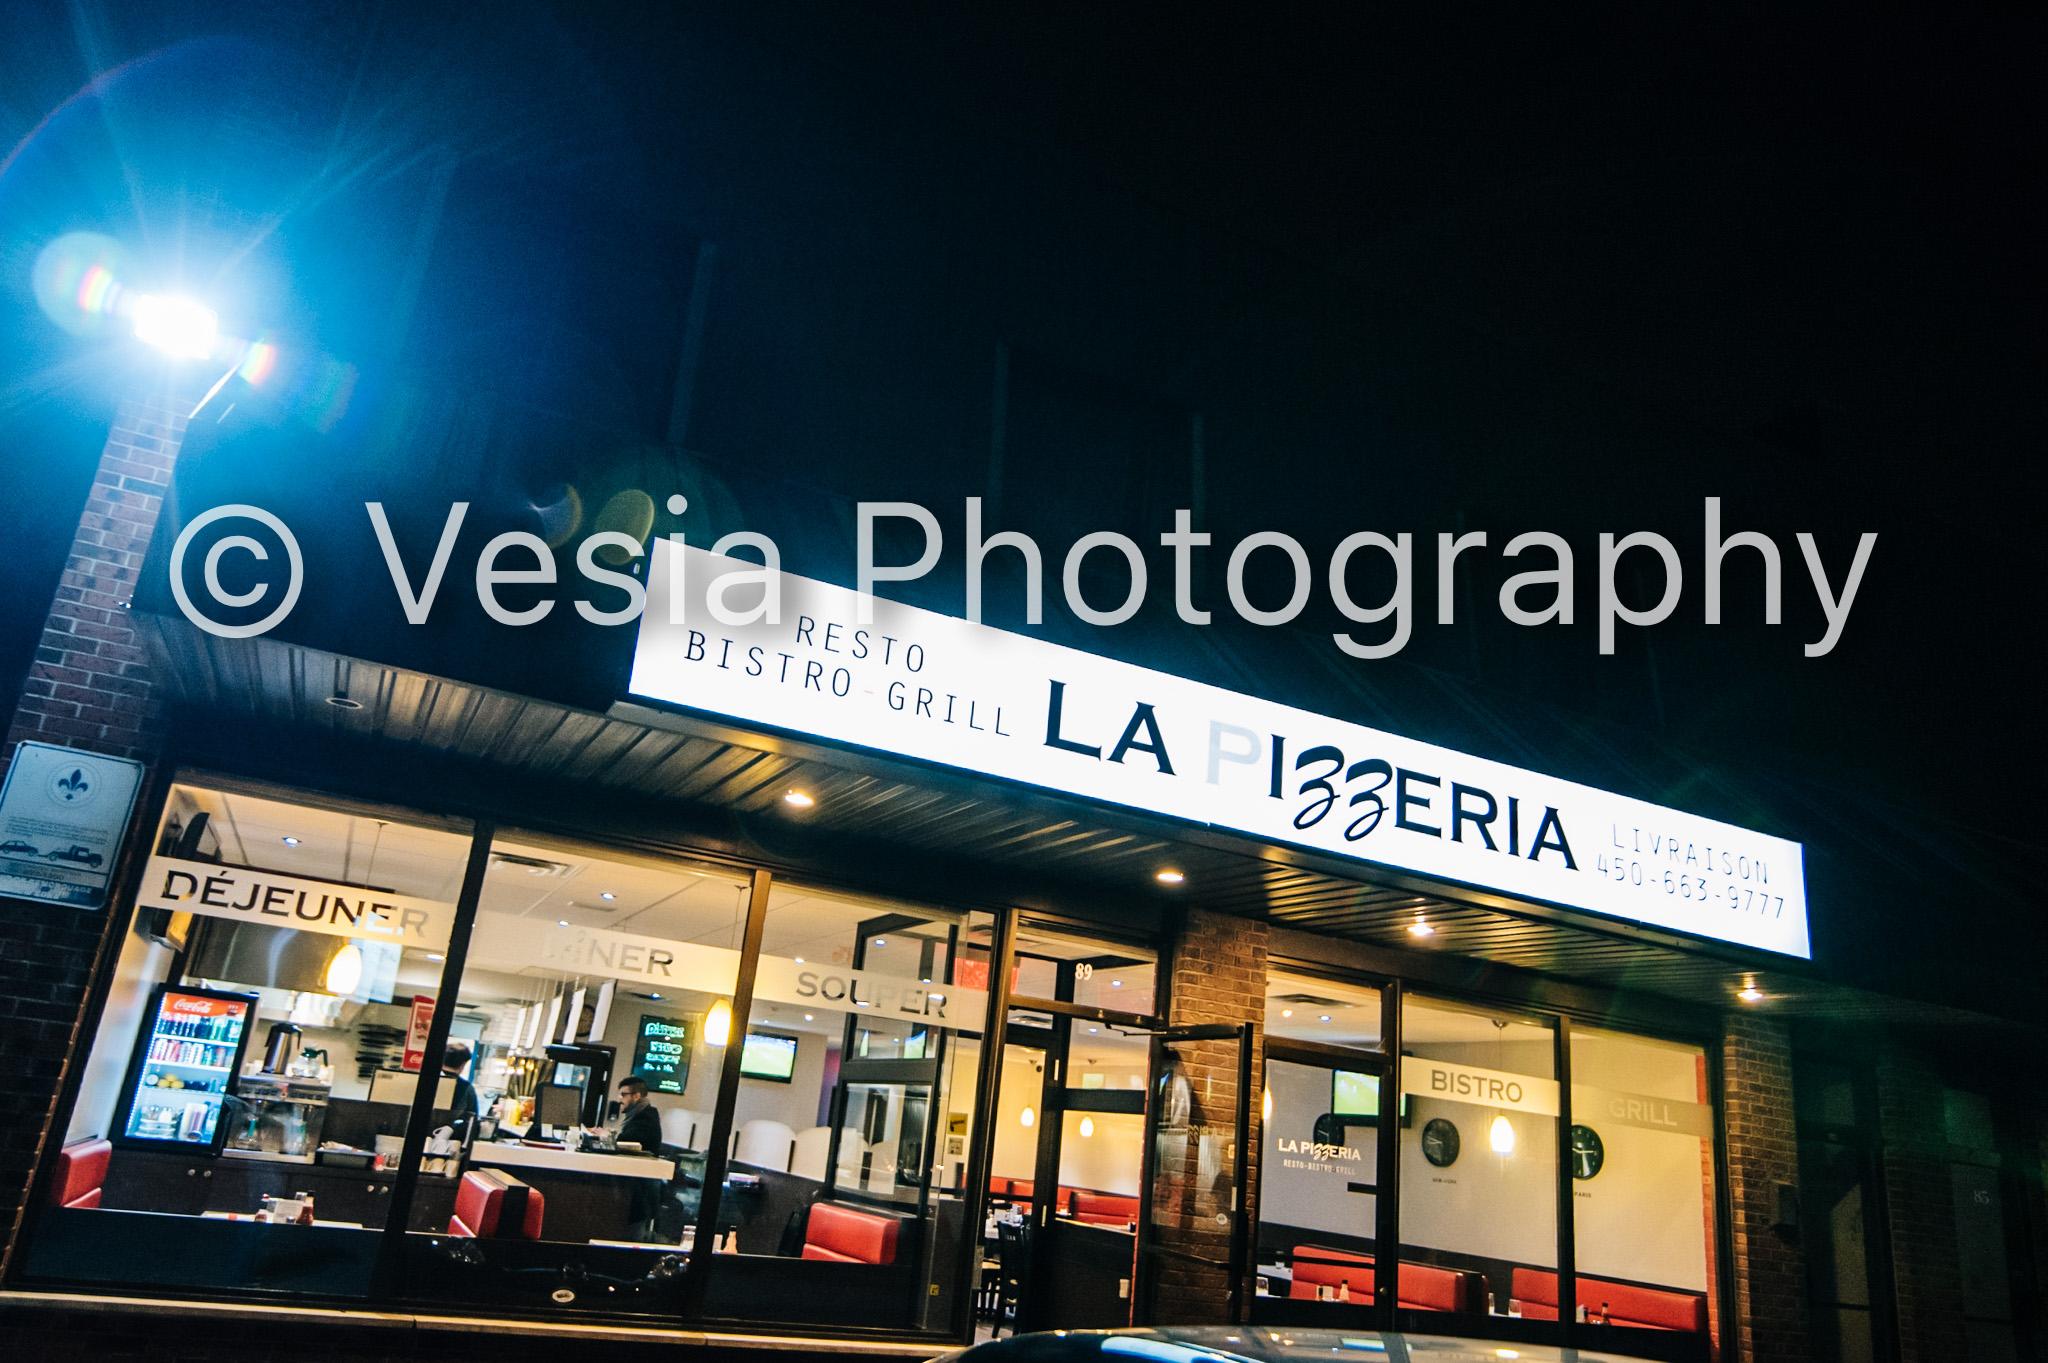 Bistro PIzzeria_Proofs-14.jpg